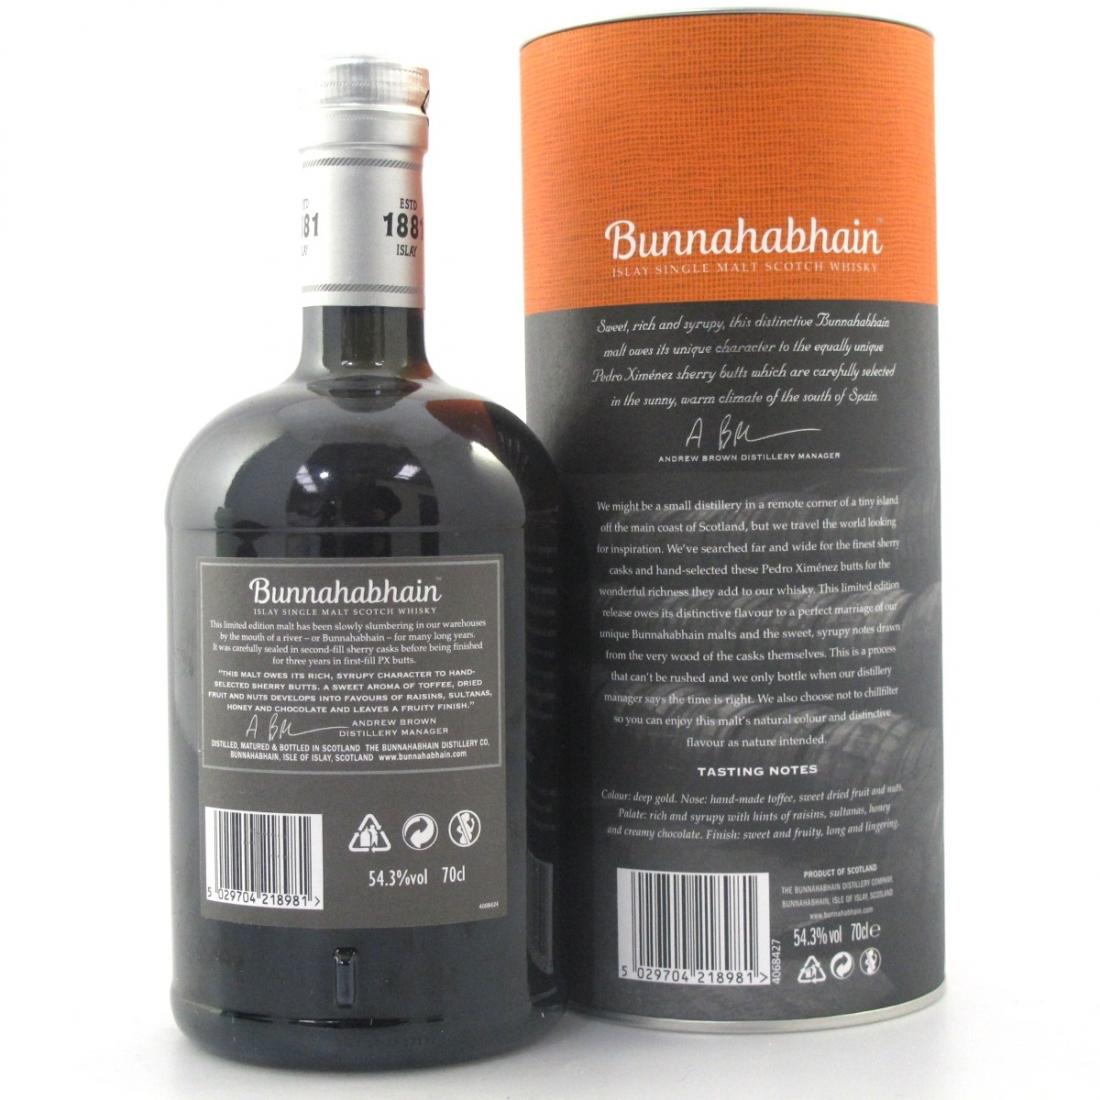 Bunnahabhain 2003 Limited Release Pedro Ximenez Finish